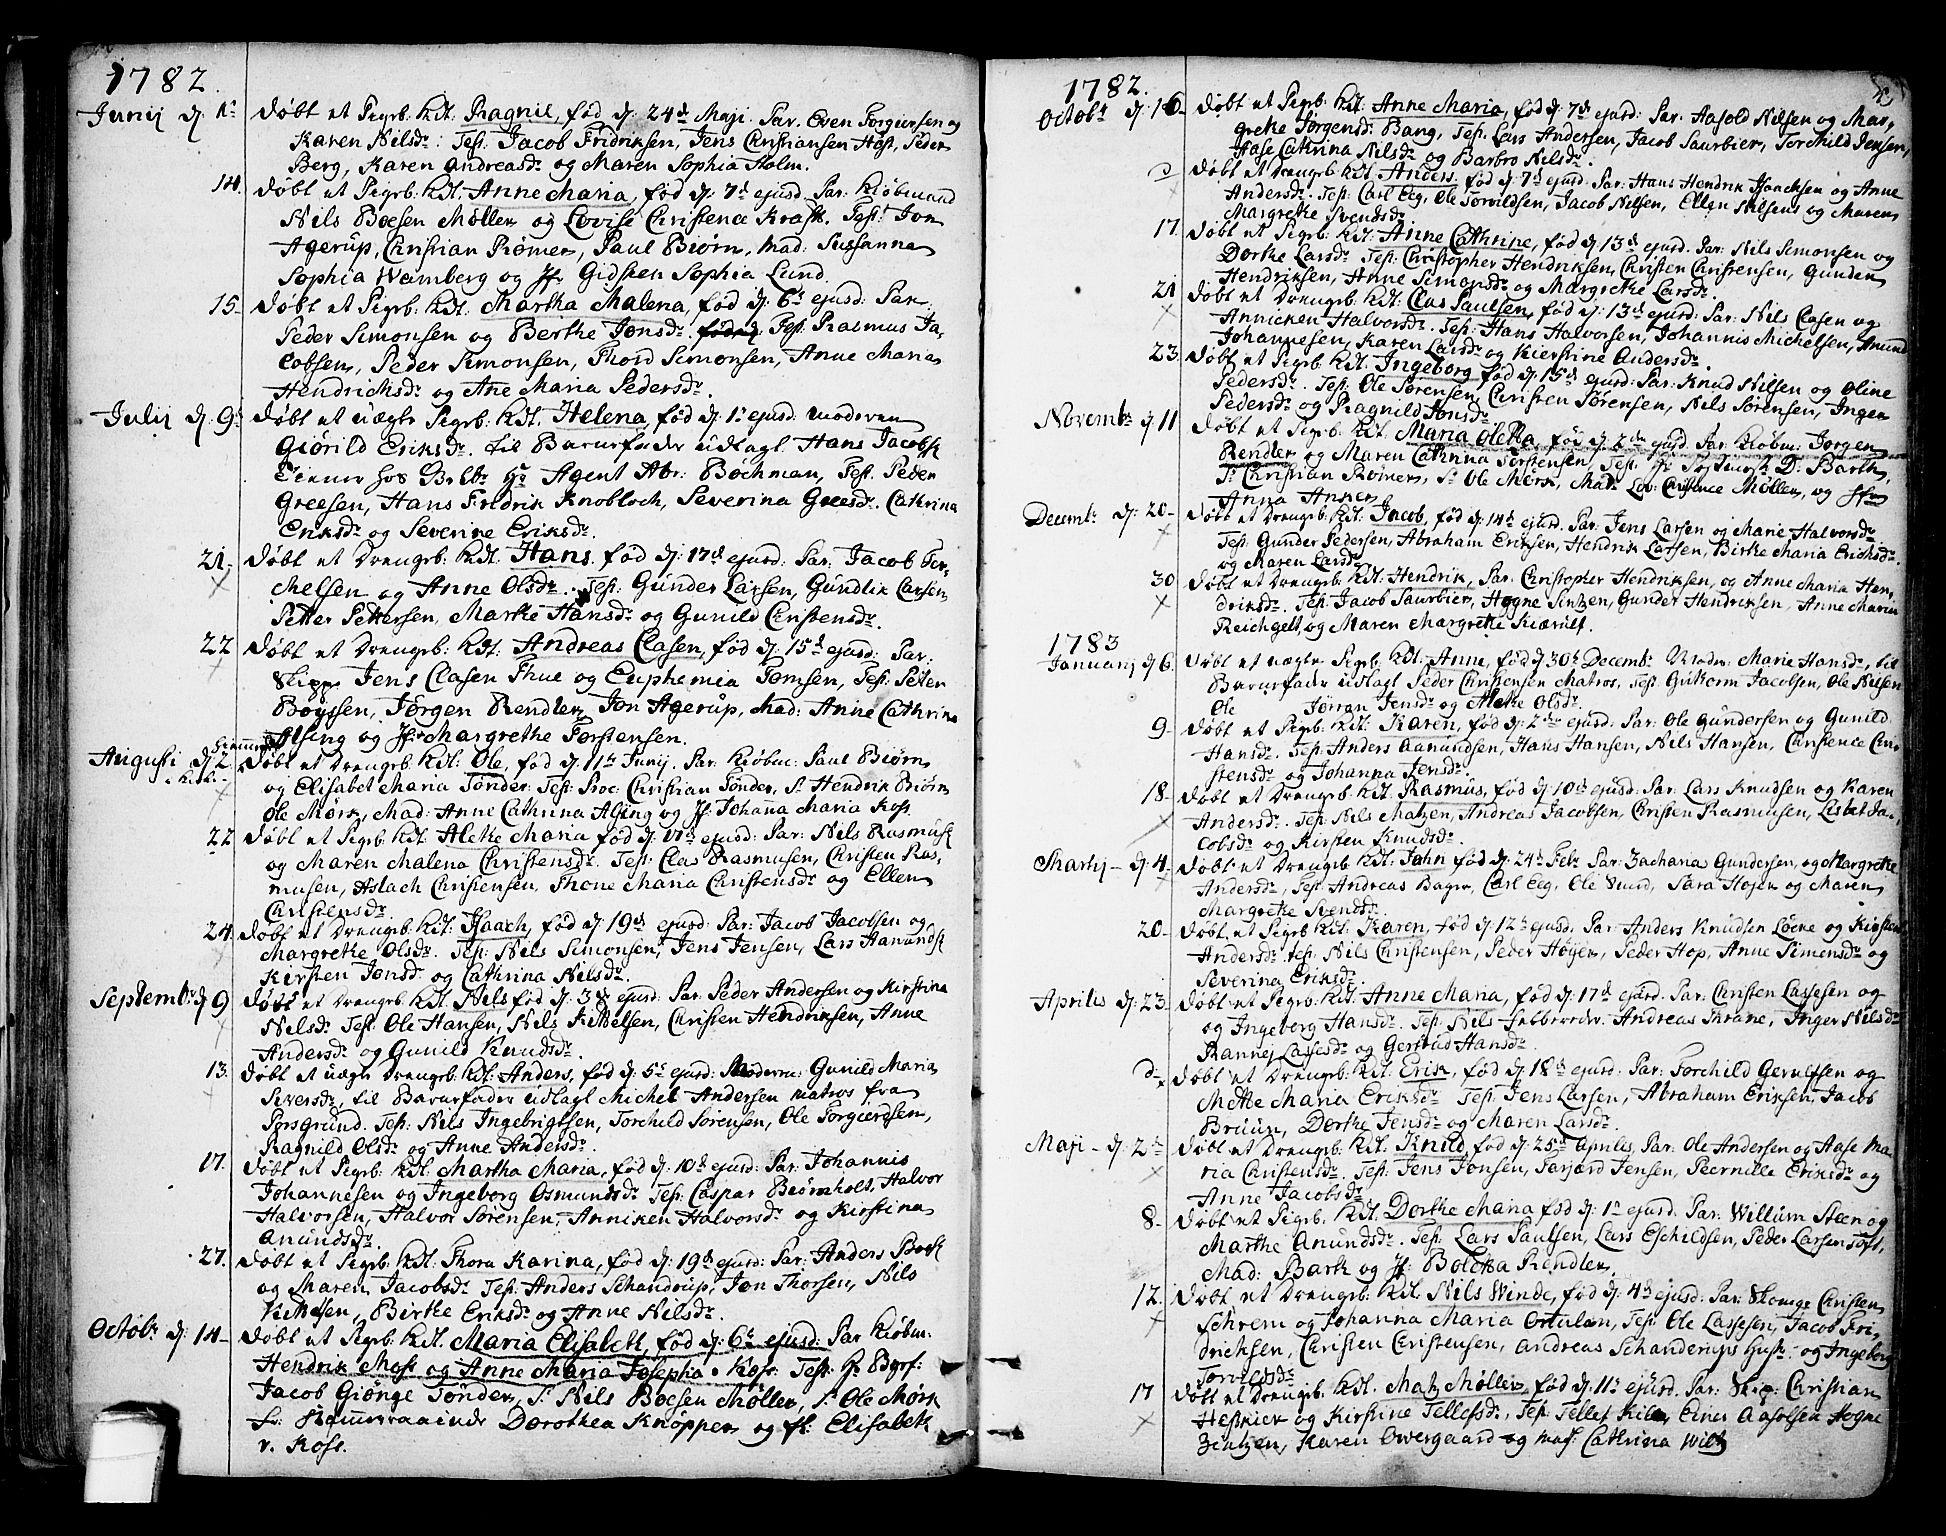 SAKO, Kragerø kirkebøker, F/Fa/L0002: Ministerialbok nr. 2, 1767-1802, s. 49